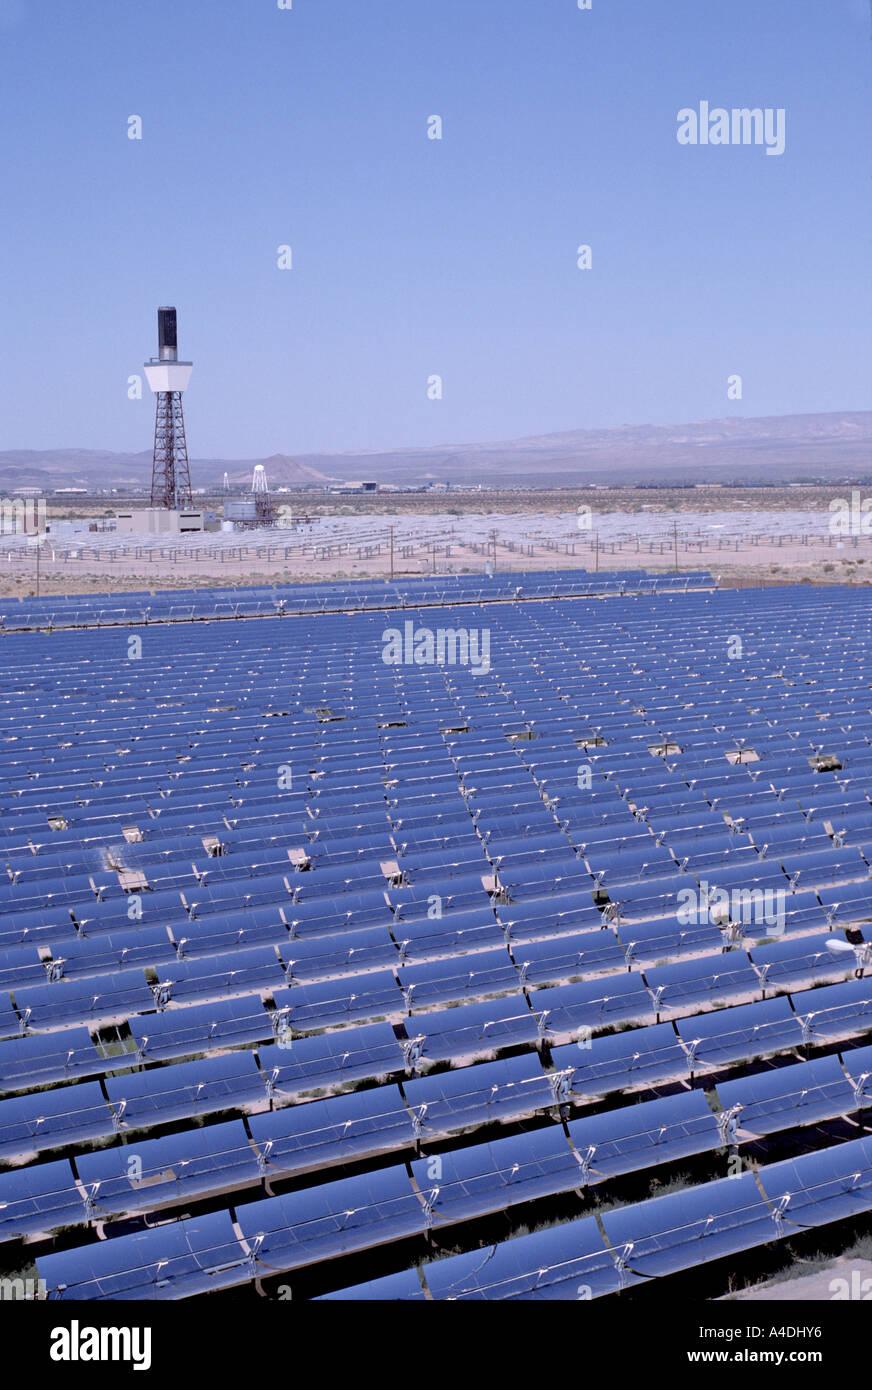 Eco friendly solar energy field with parabolic reflectors heat oil